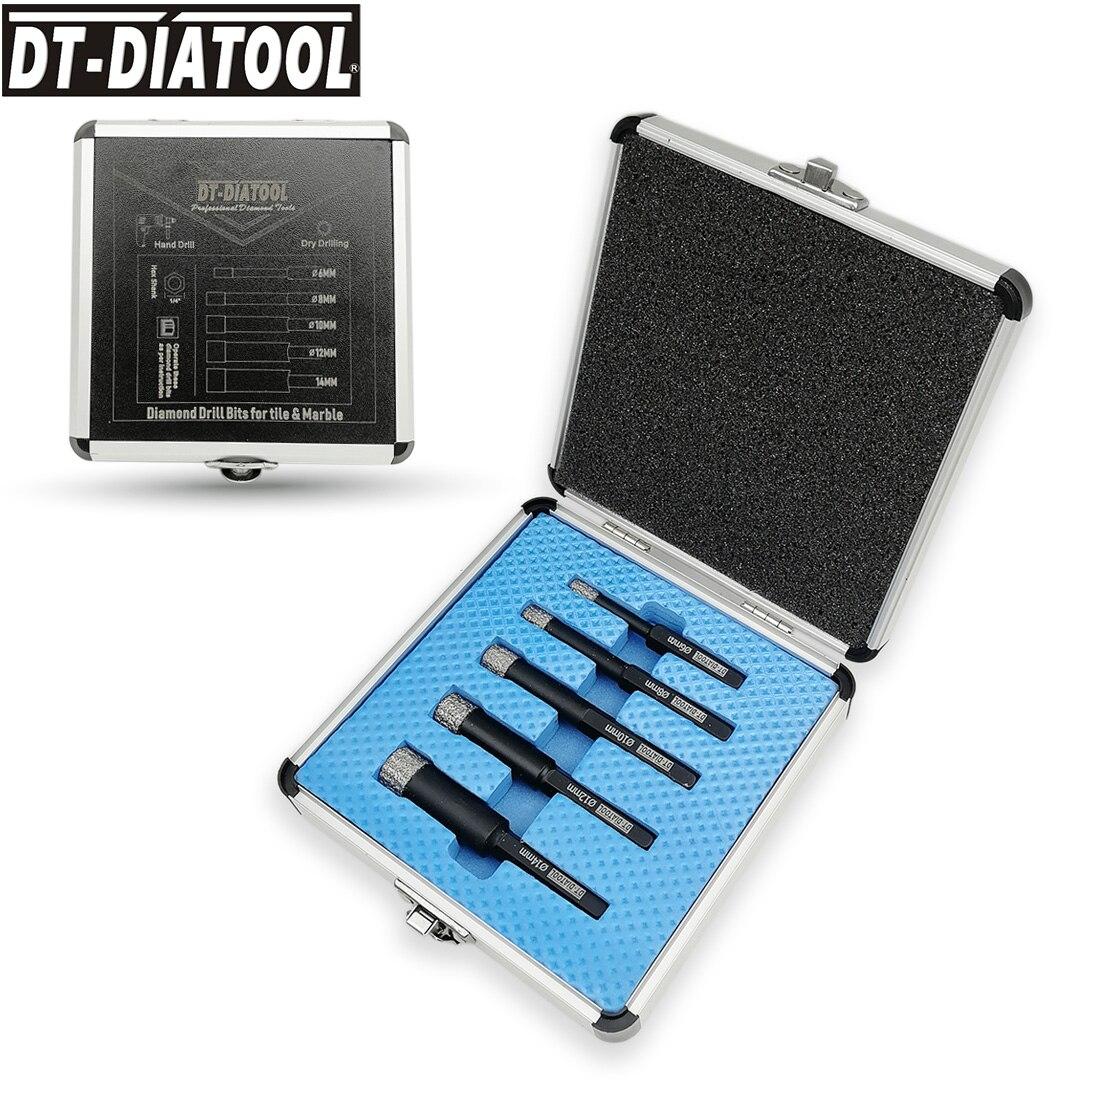 DT-DIATOOL 5pcs/box Vacuum Brazed Dry Diamond Drilling Core Bits Hole Saw